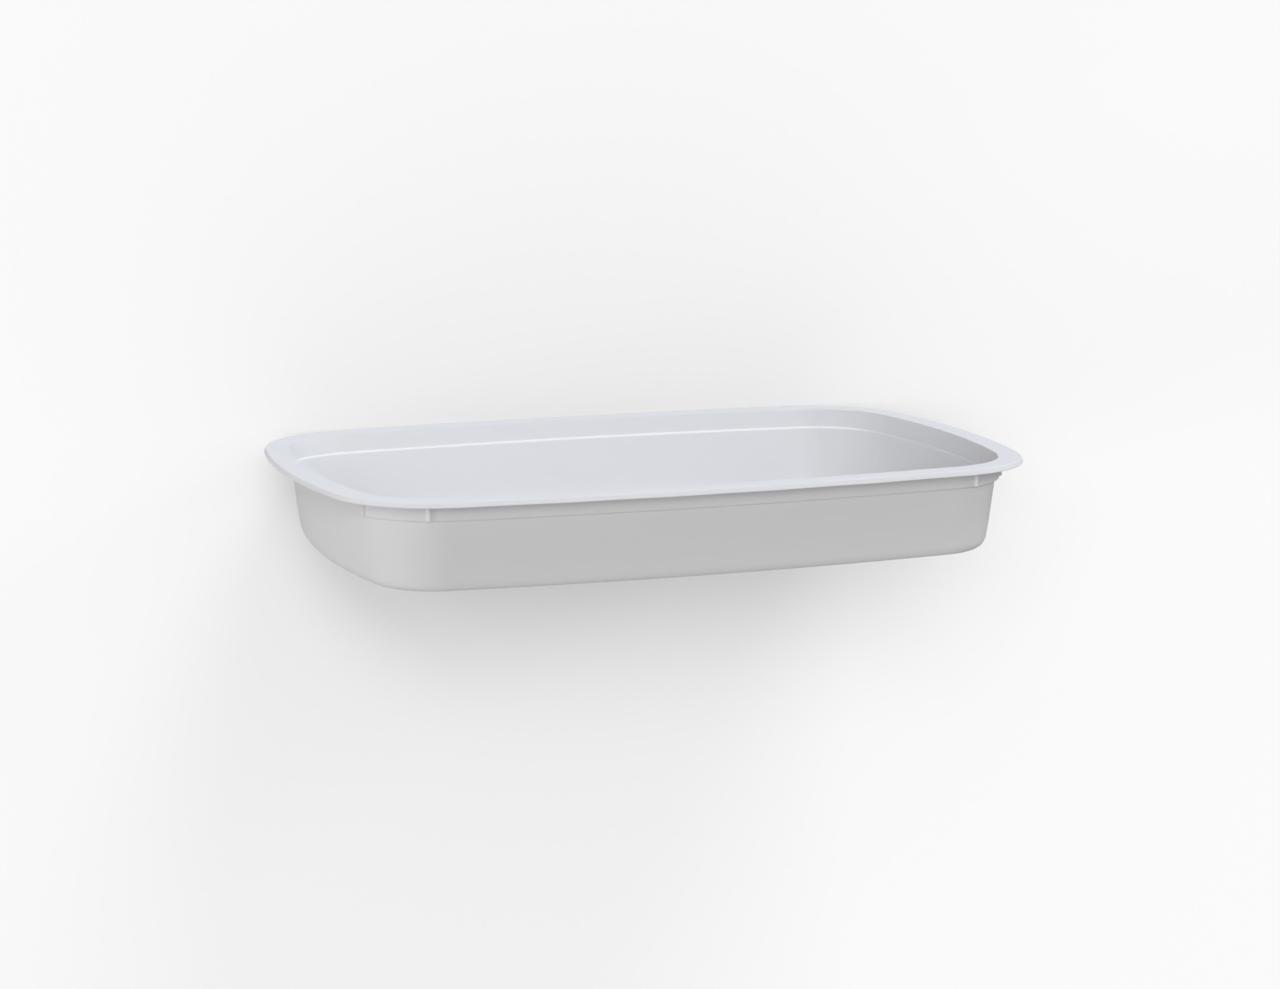 Barquette Euroduo operculable blanche 1280 cm3